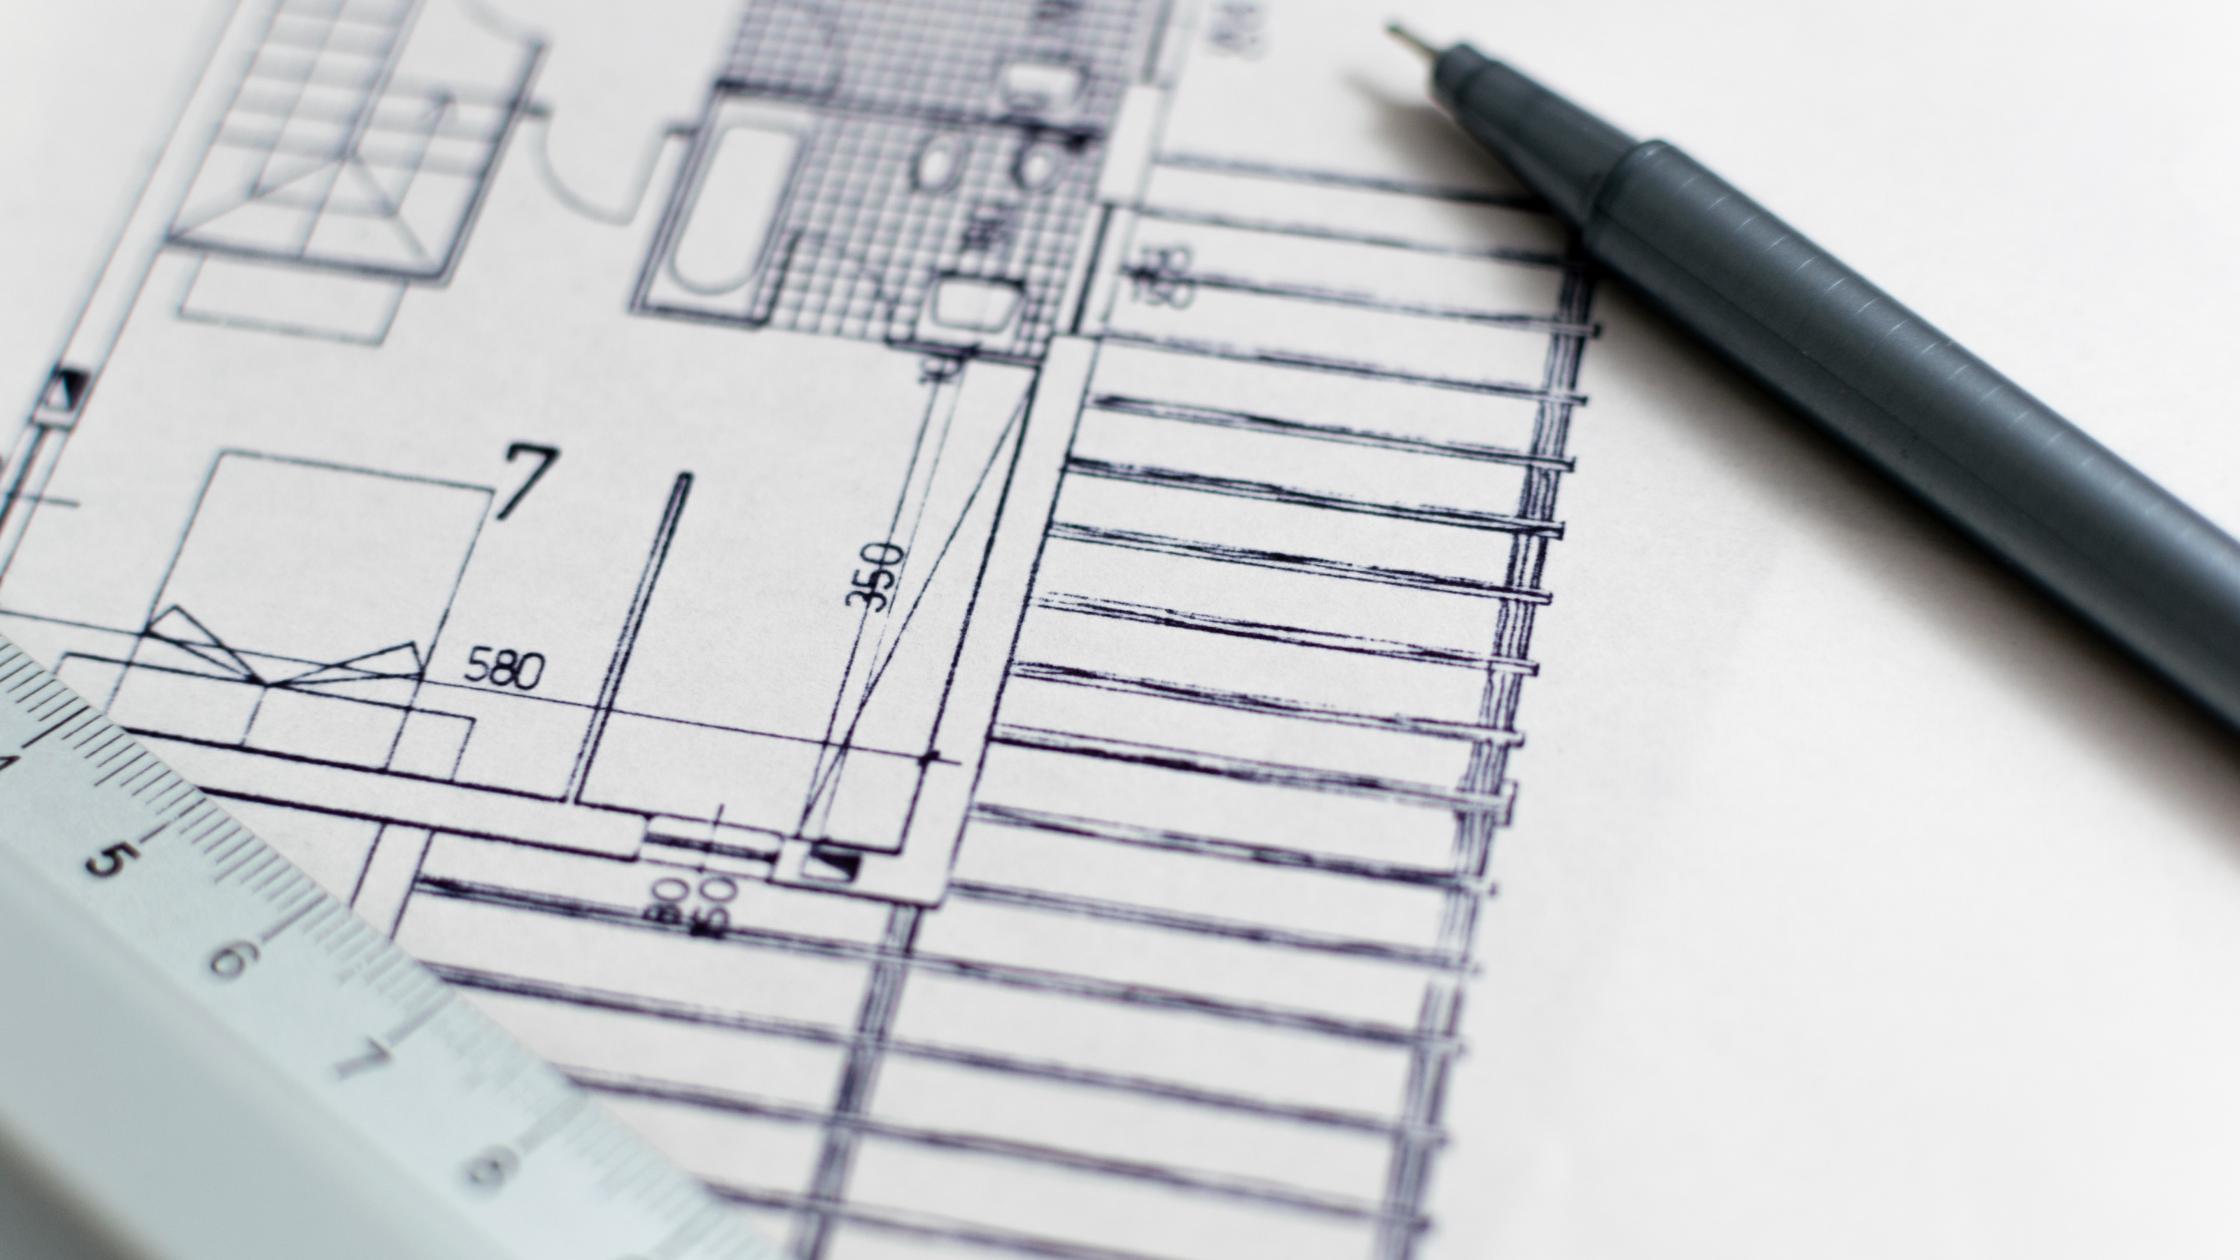 Architecture draft paper